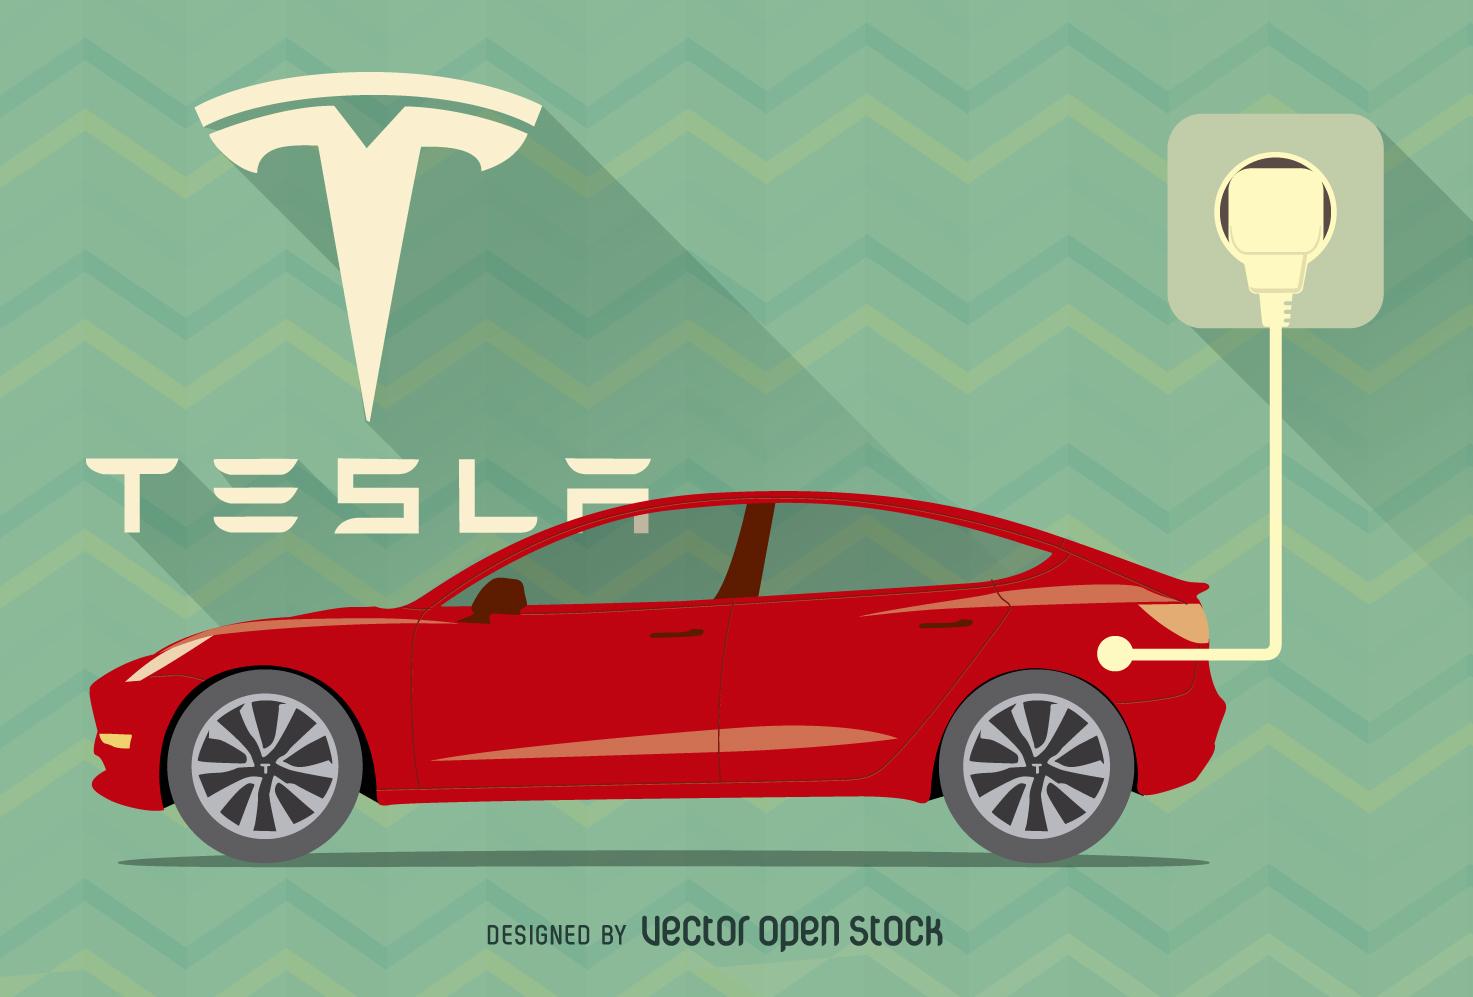 Download Large Image 1473x997px - Tesla Vector PNG